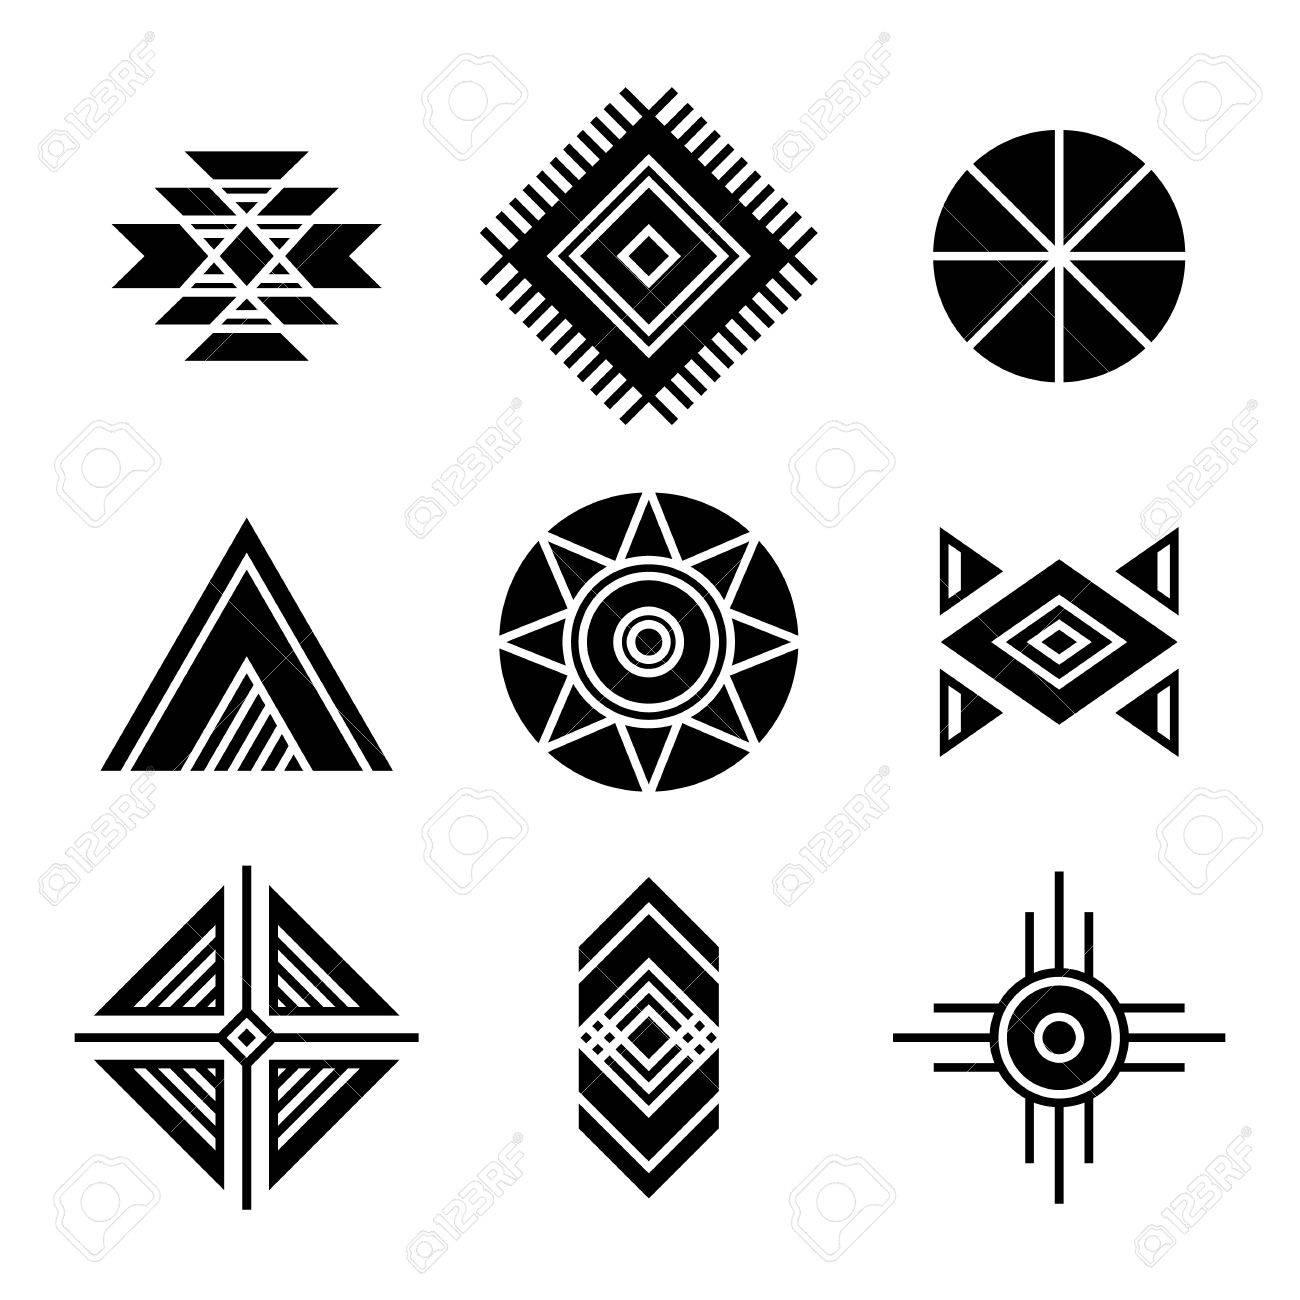 Native american indians tribal symbols set geometric shapes native american indians tribal symbols set geometric shapes icons isolated on white stock vector biocorpaavc Images